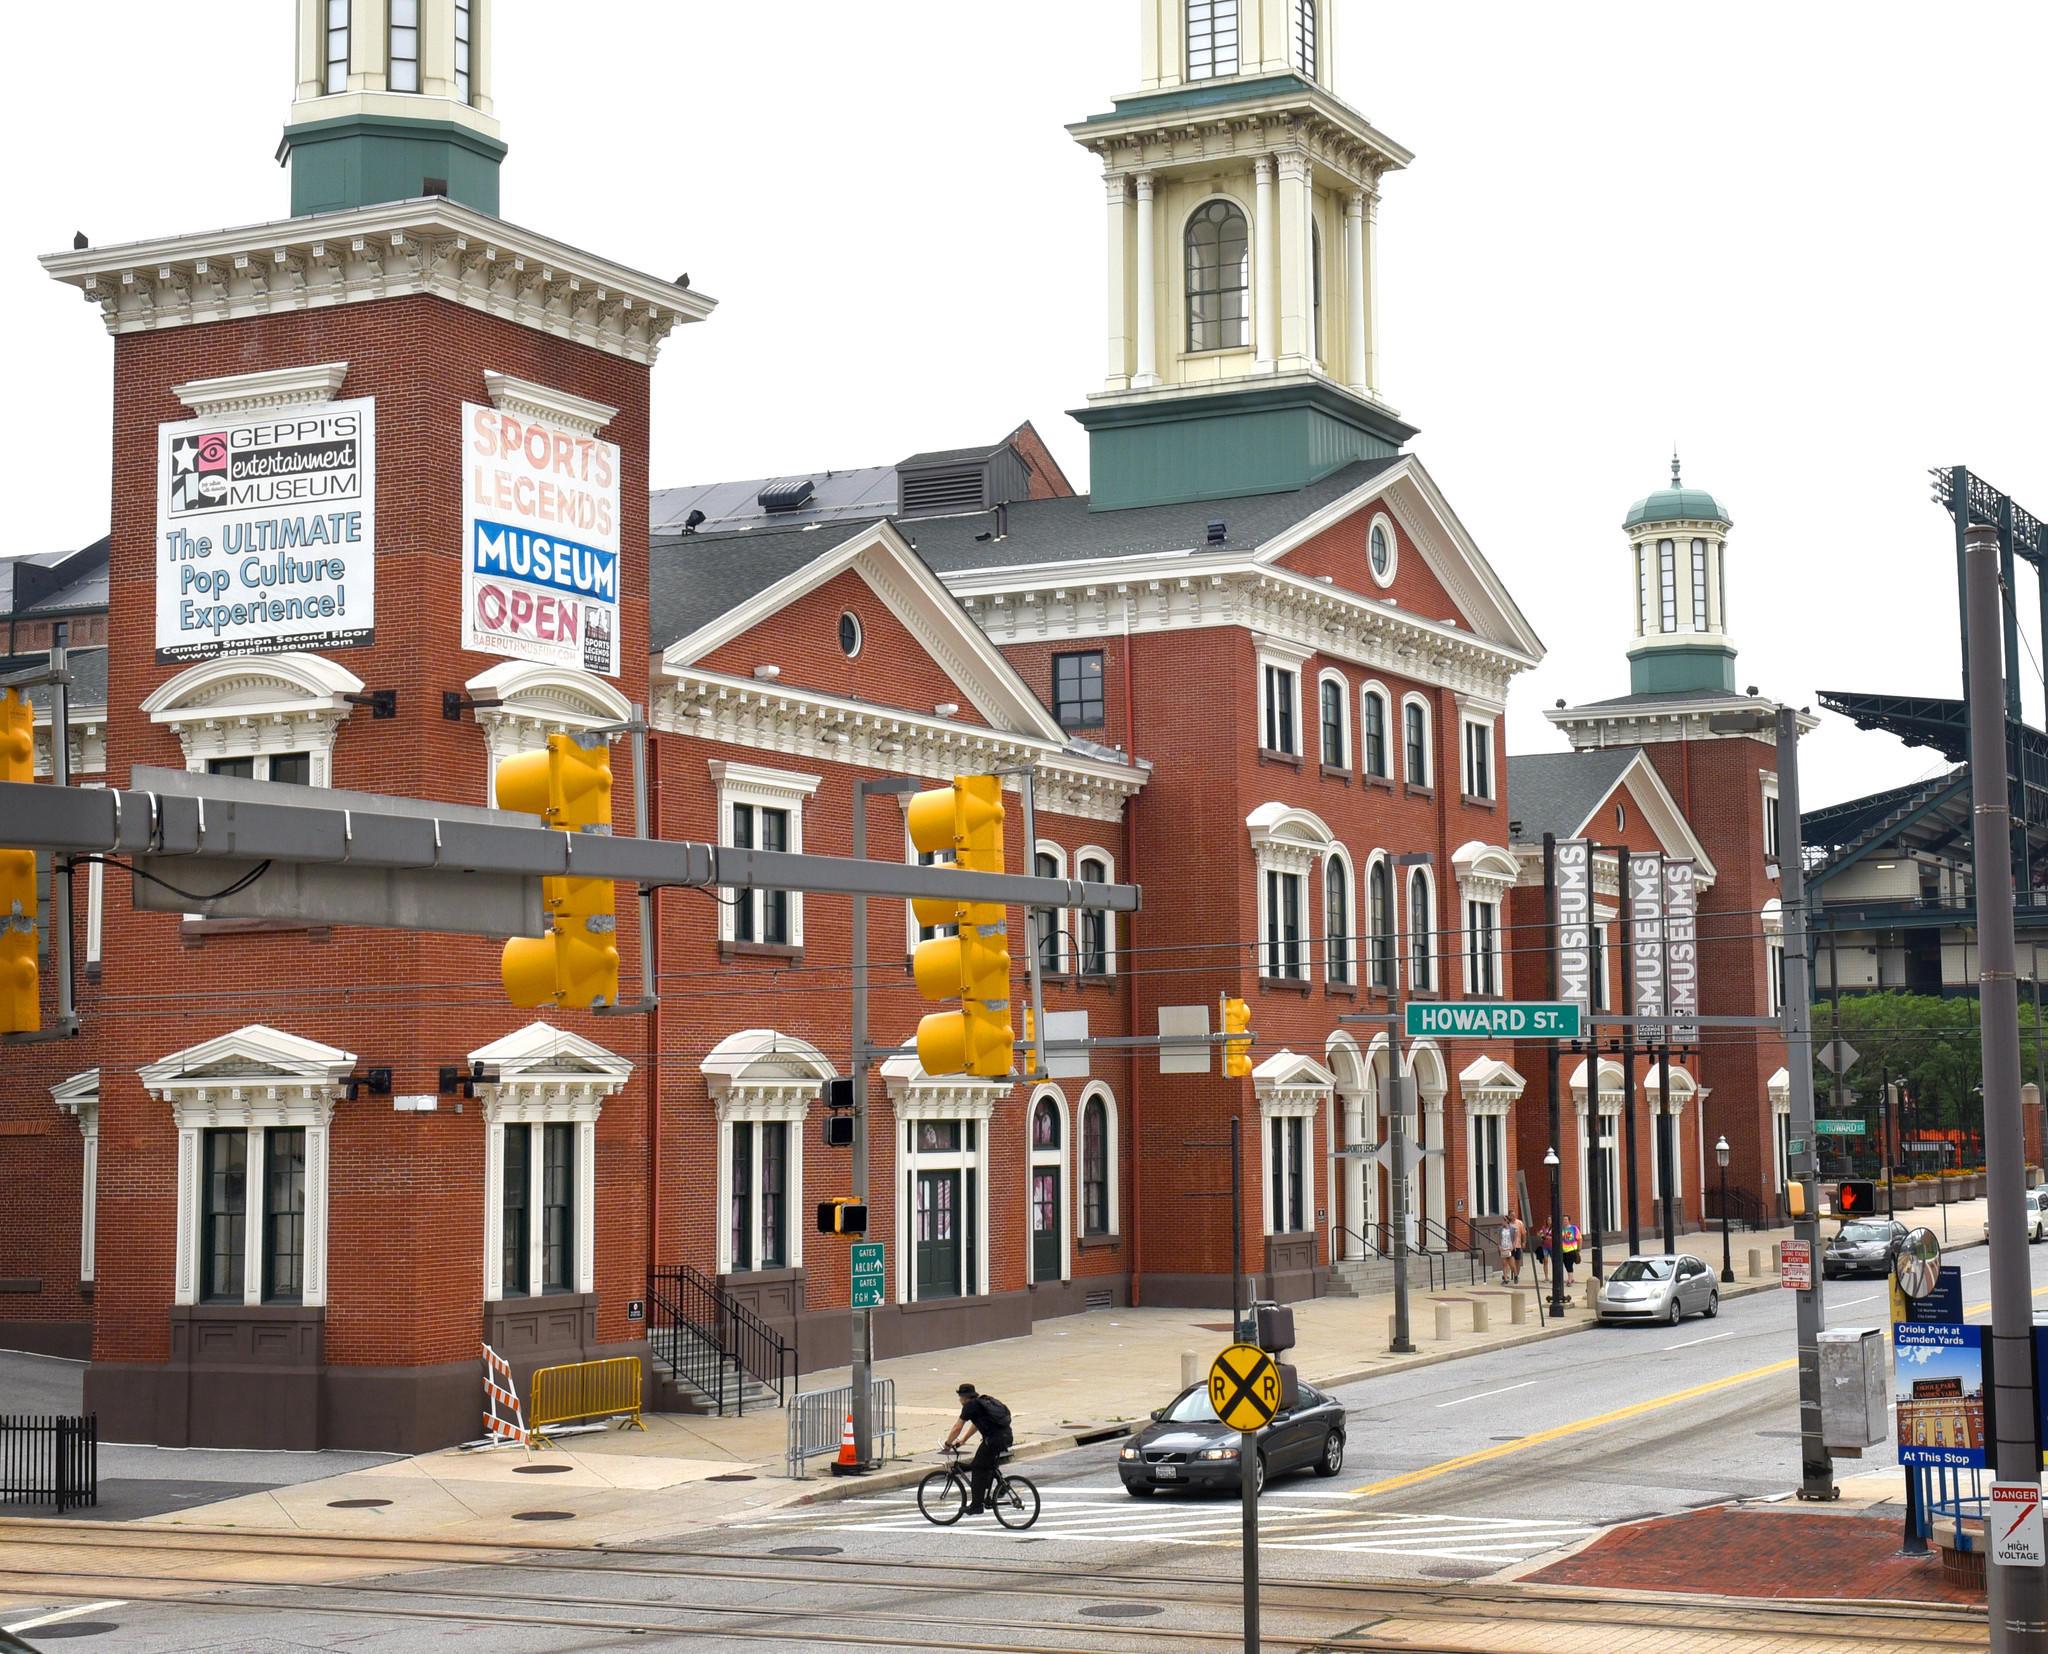 Camden Station Baltimore, Maryland Date: 2015. Source: Unknown.